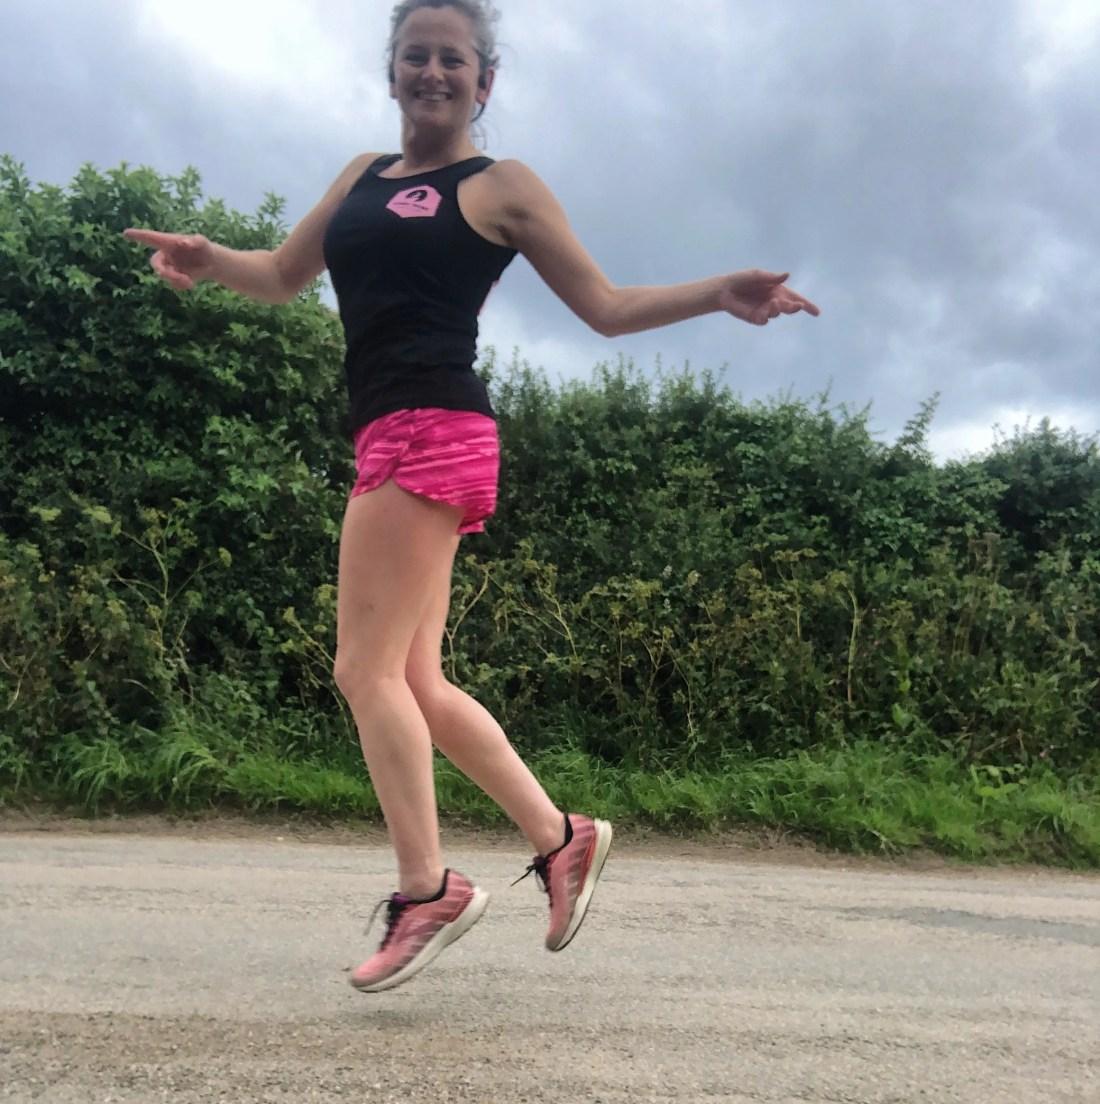 Woman running along a road